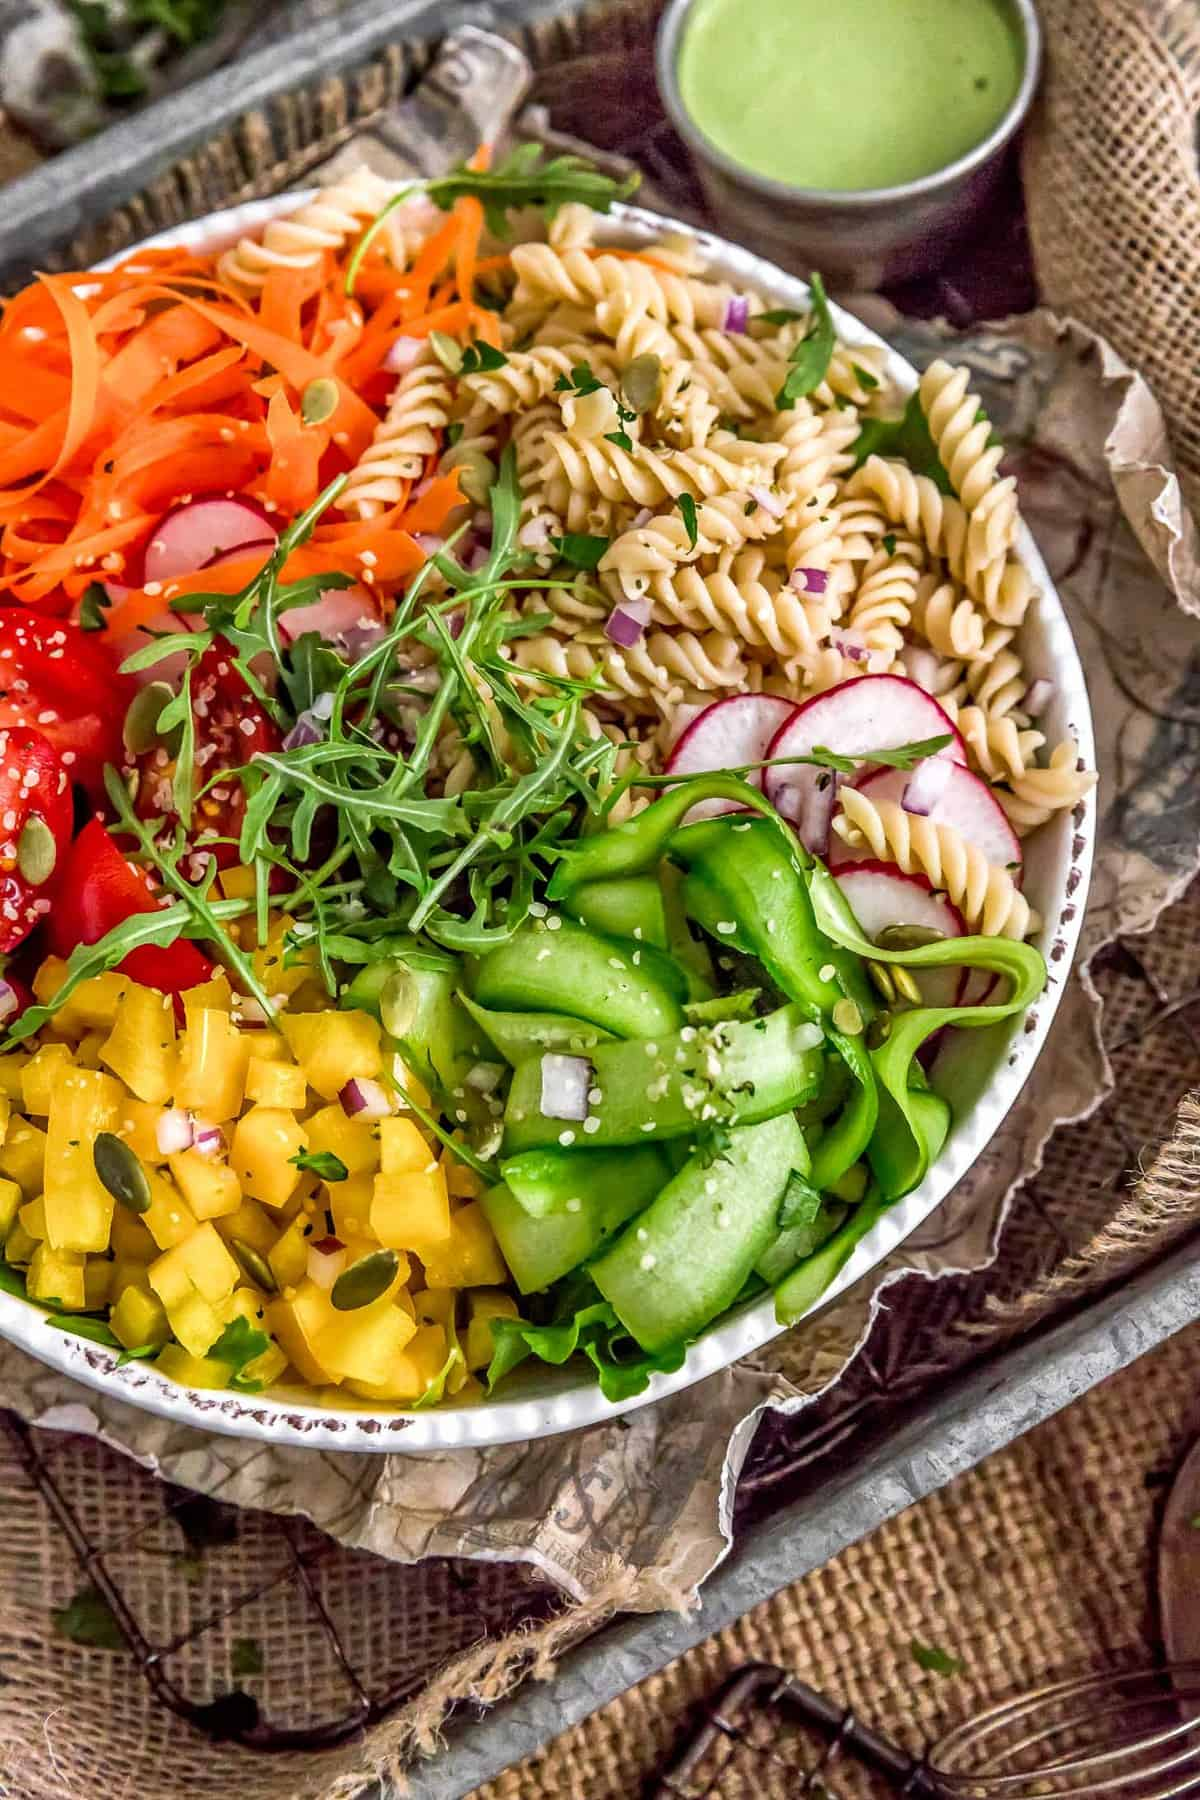 Veggie bowl with a side of Vegan Green Goddess Dressing